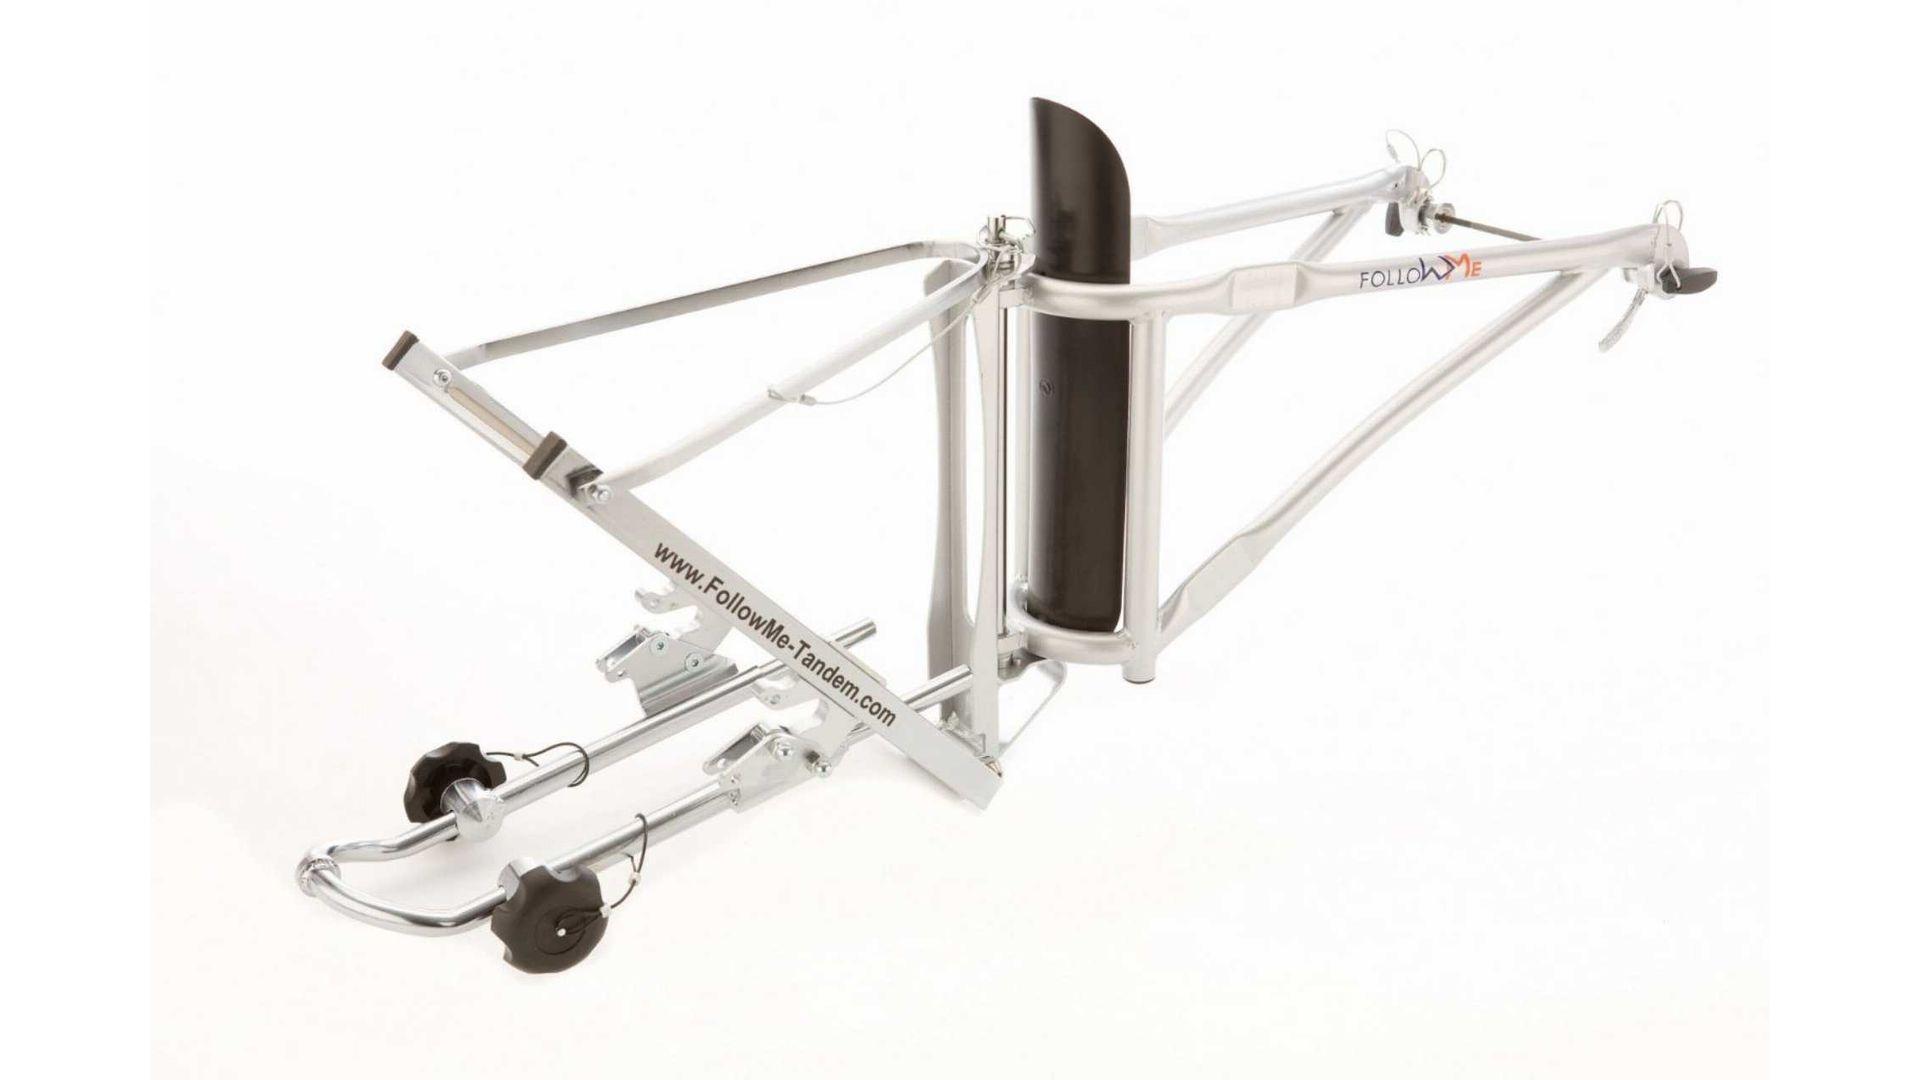 followme set vorrichtung zum anh ngen v kinderr dern die g nstig online kaufen die fahrrad. Black Bedroom Furniture Sets. Home Design Ideas